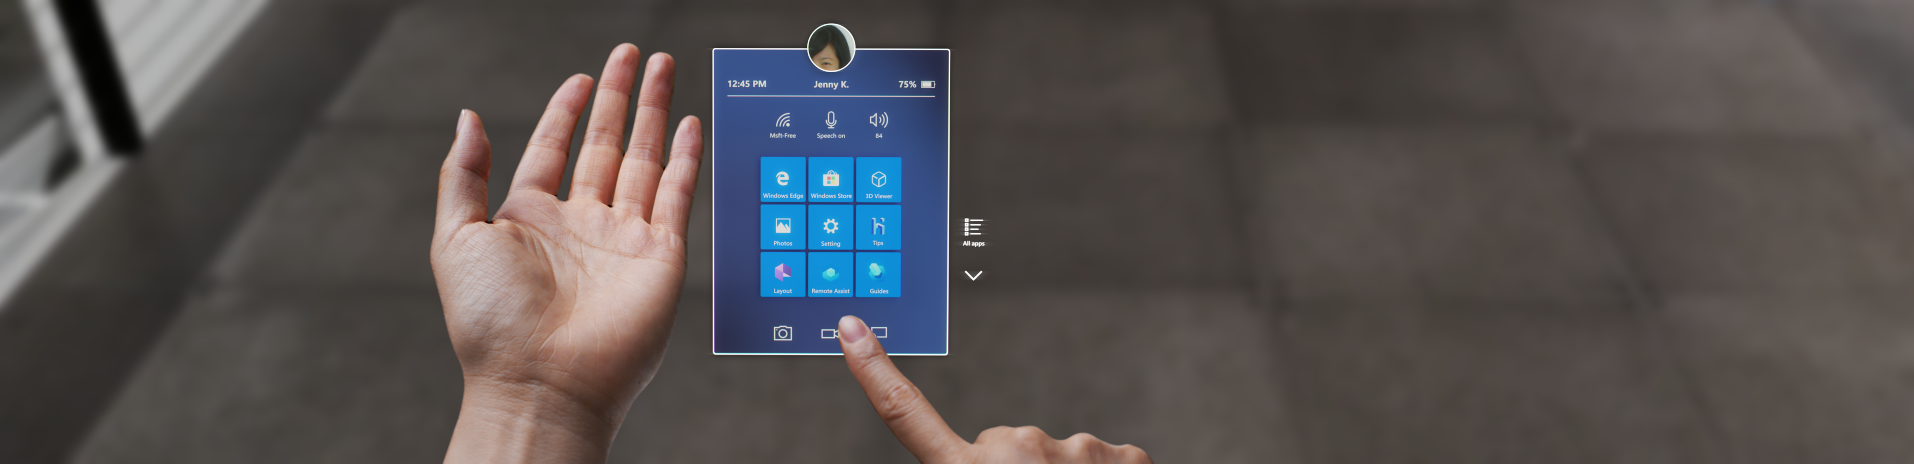 A person using their hand to navigate a menu using HoloLens 2.